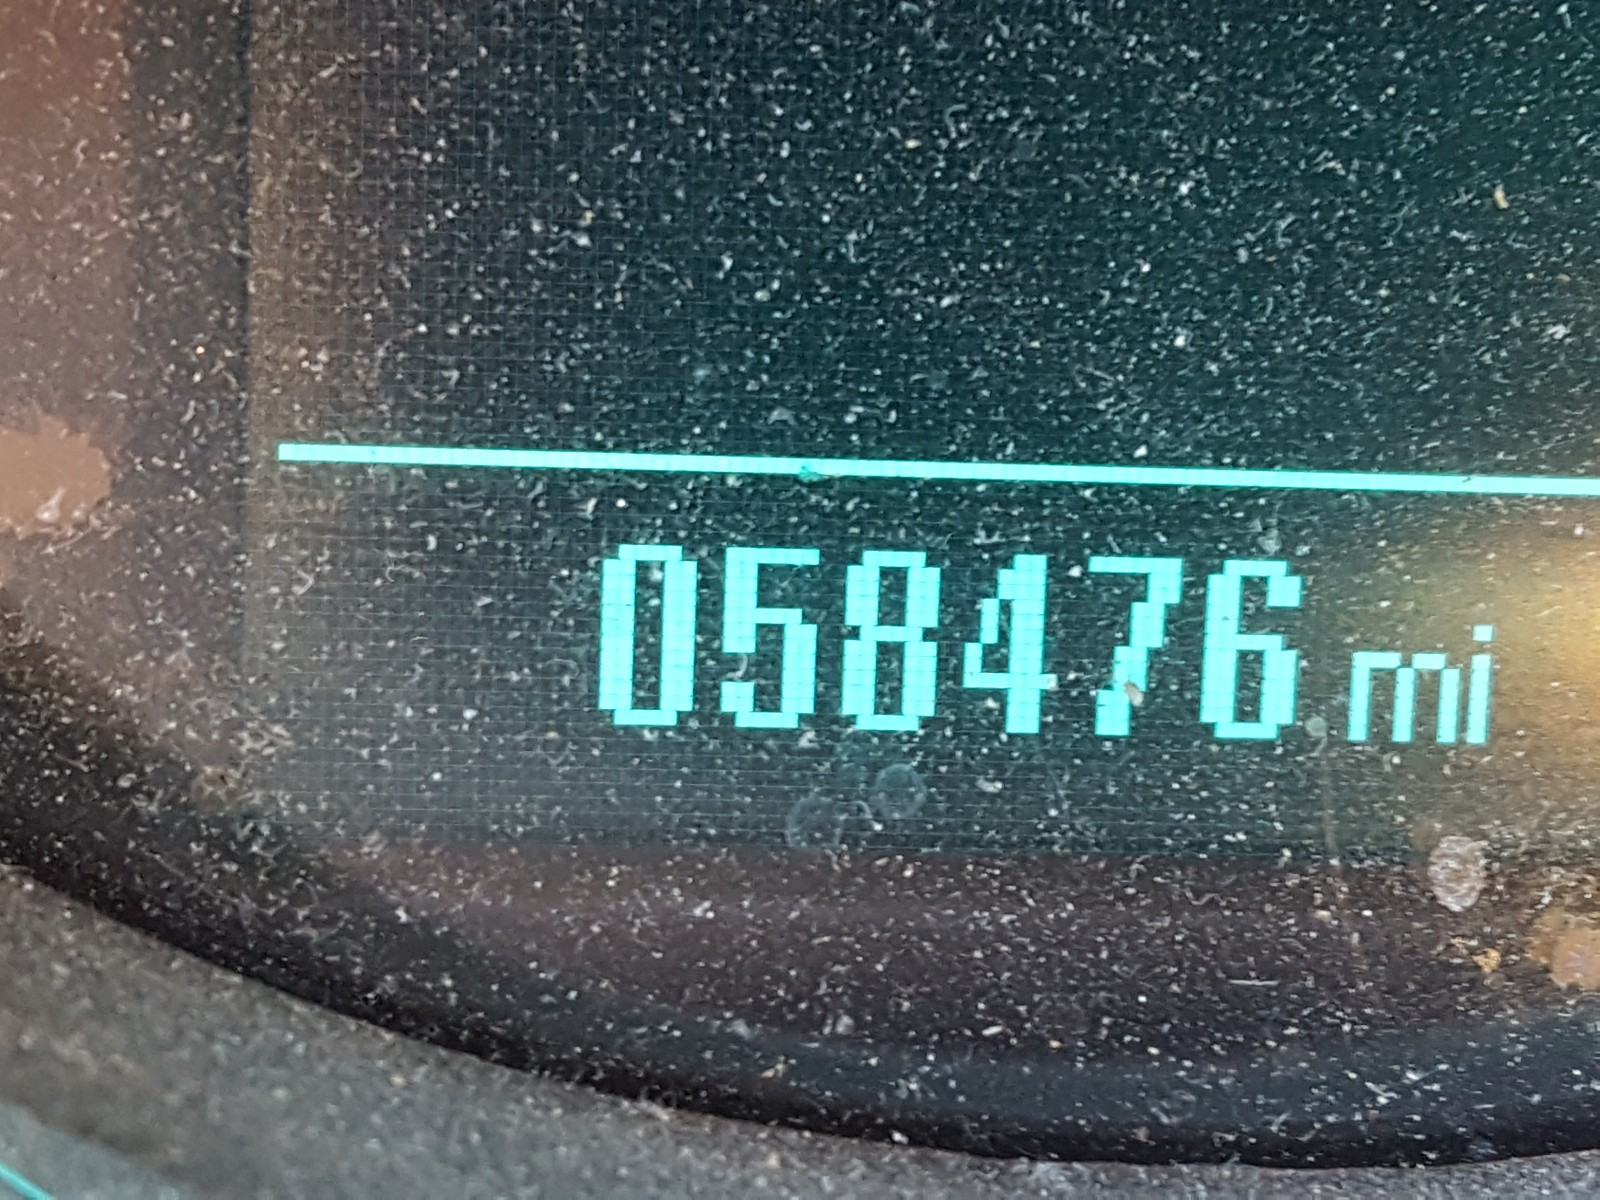 1G1PG5SB0G7130991 - 2016 Chevrolet Cruze Limi 1.4L front view